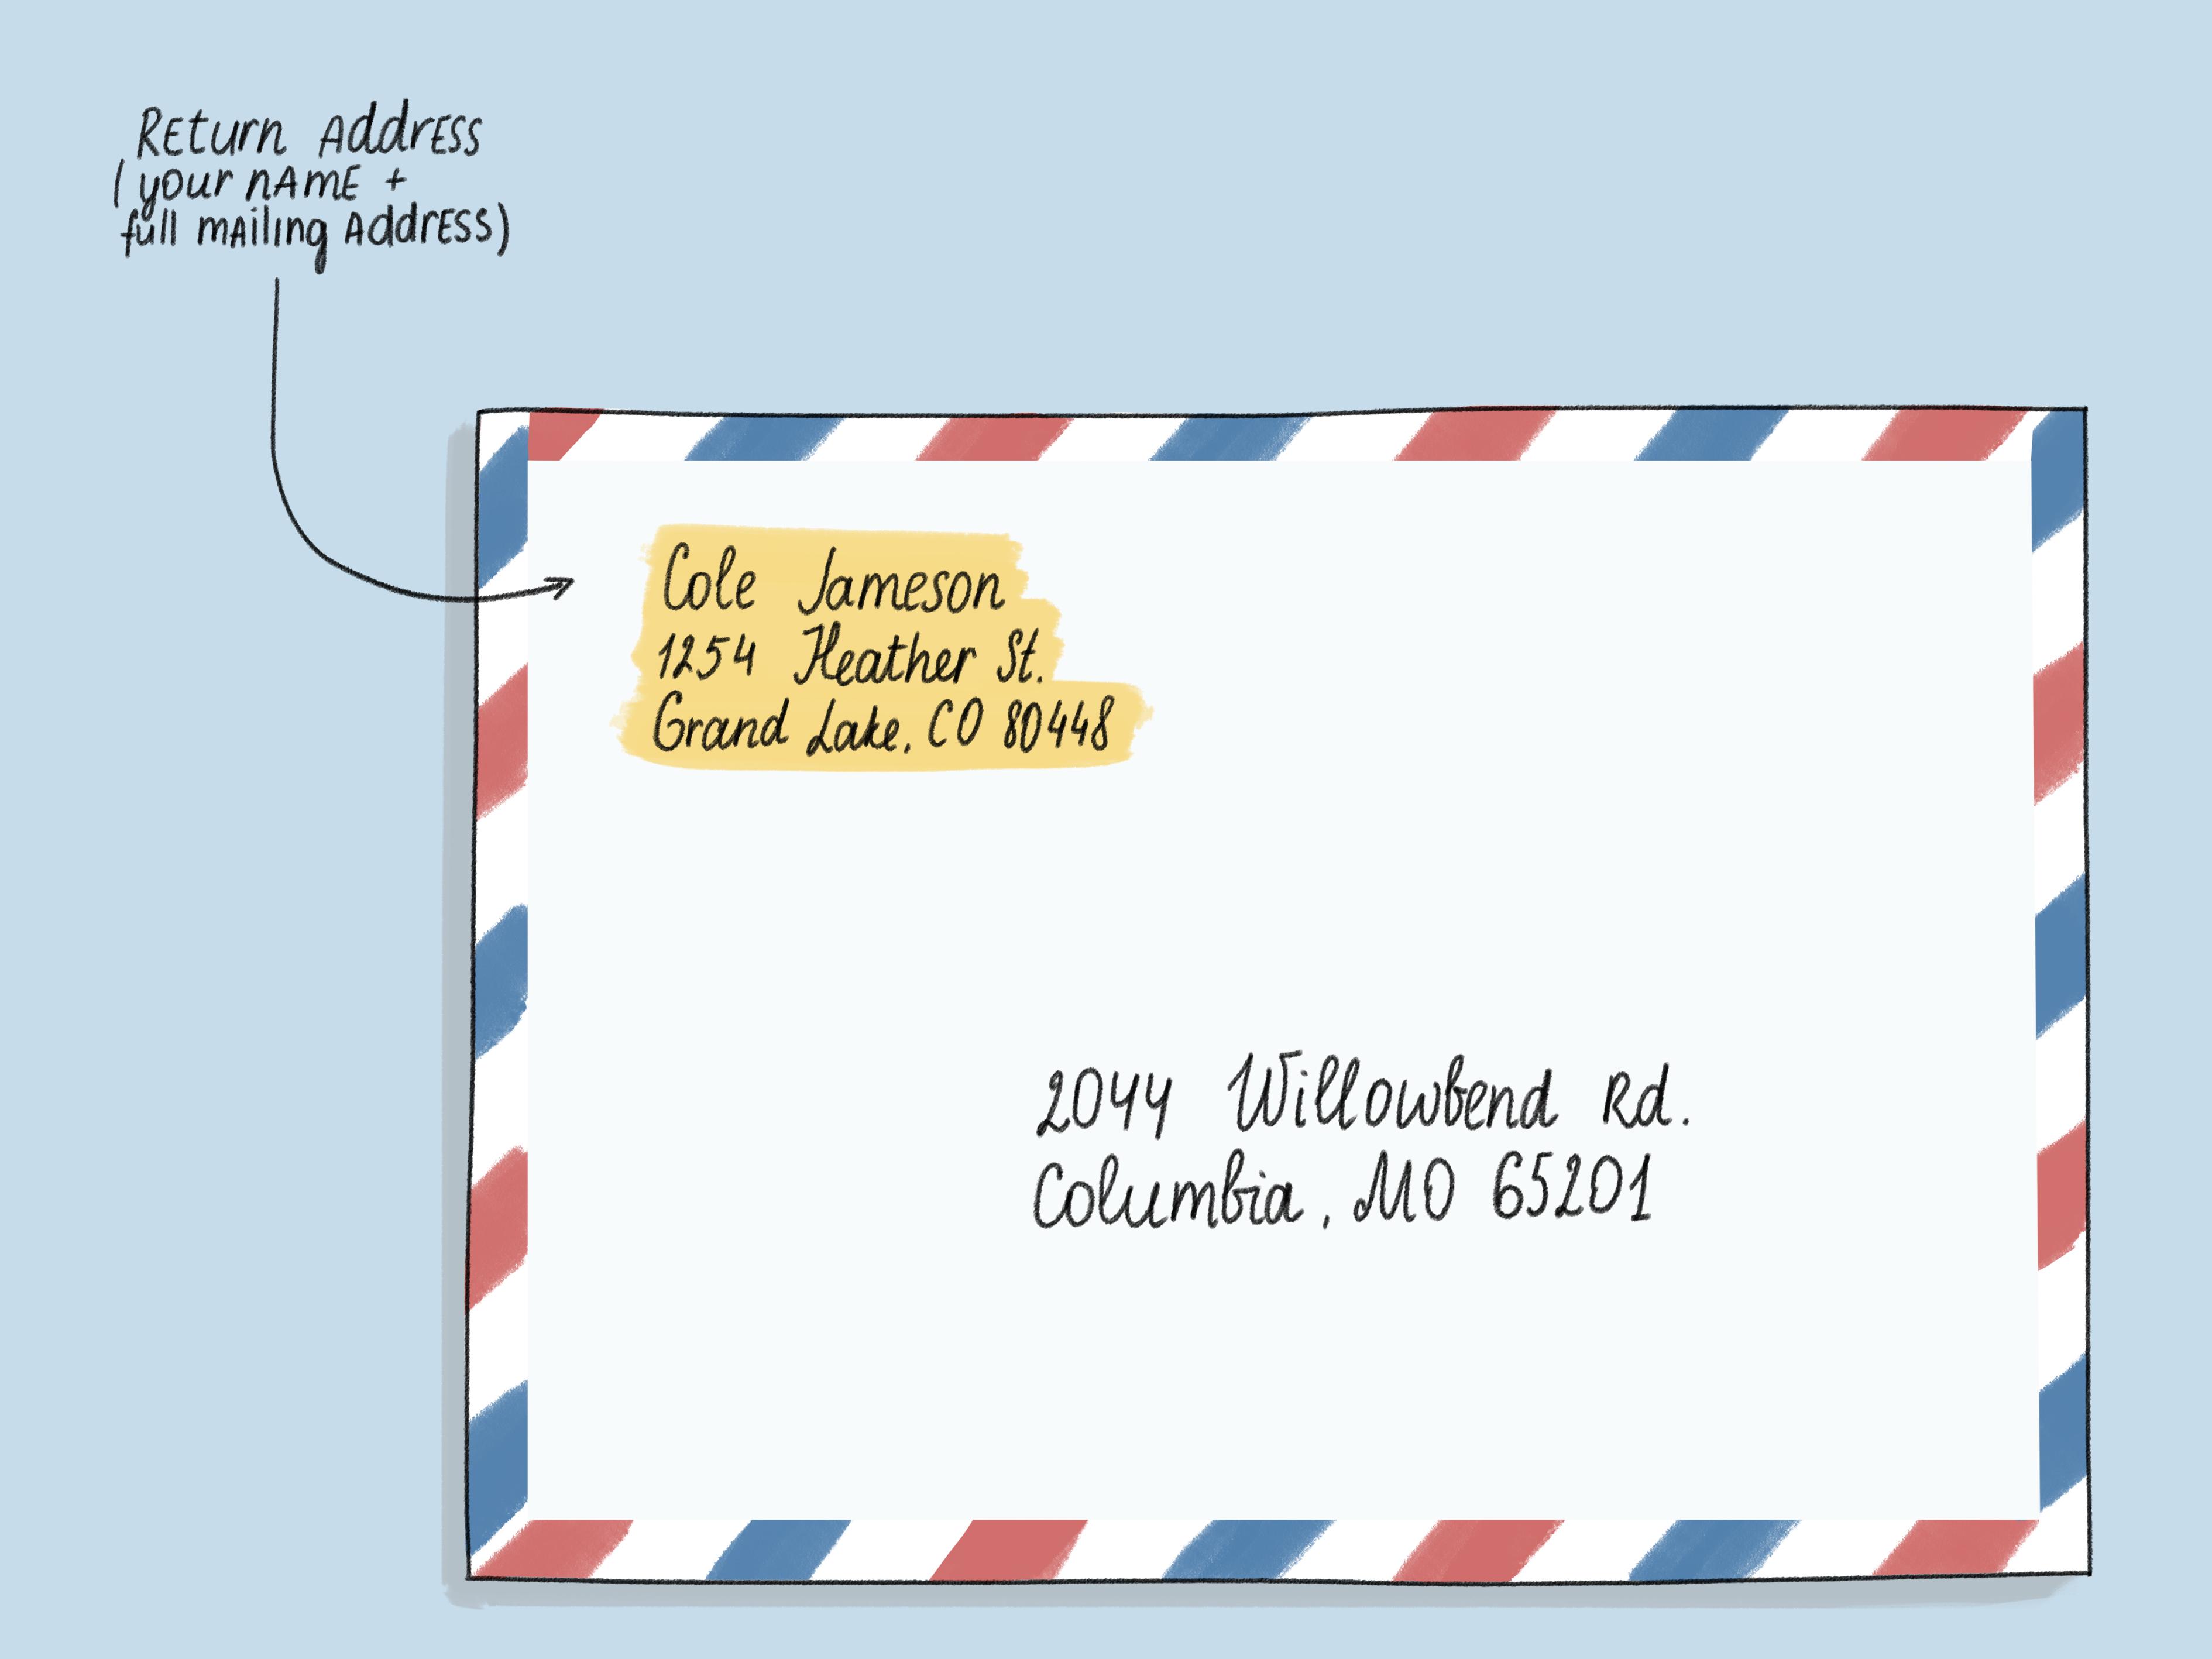 Addressing An Envelope